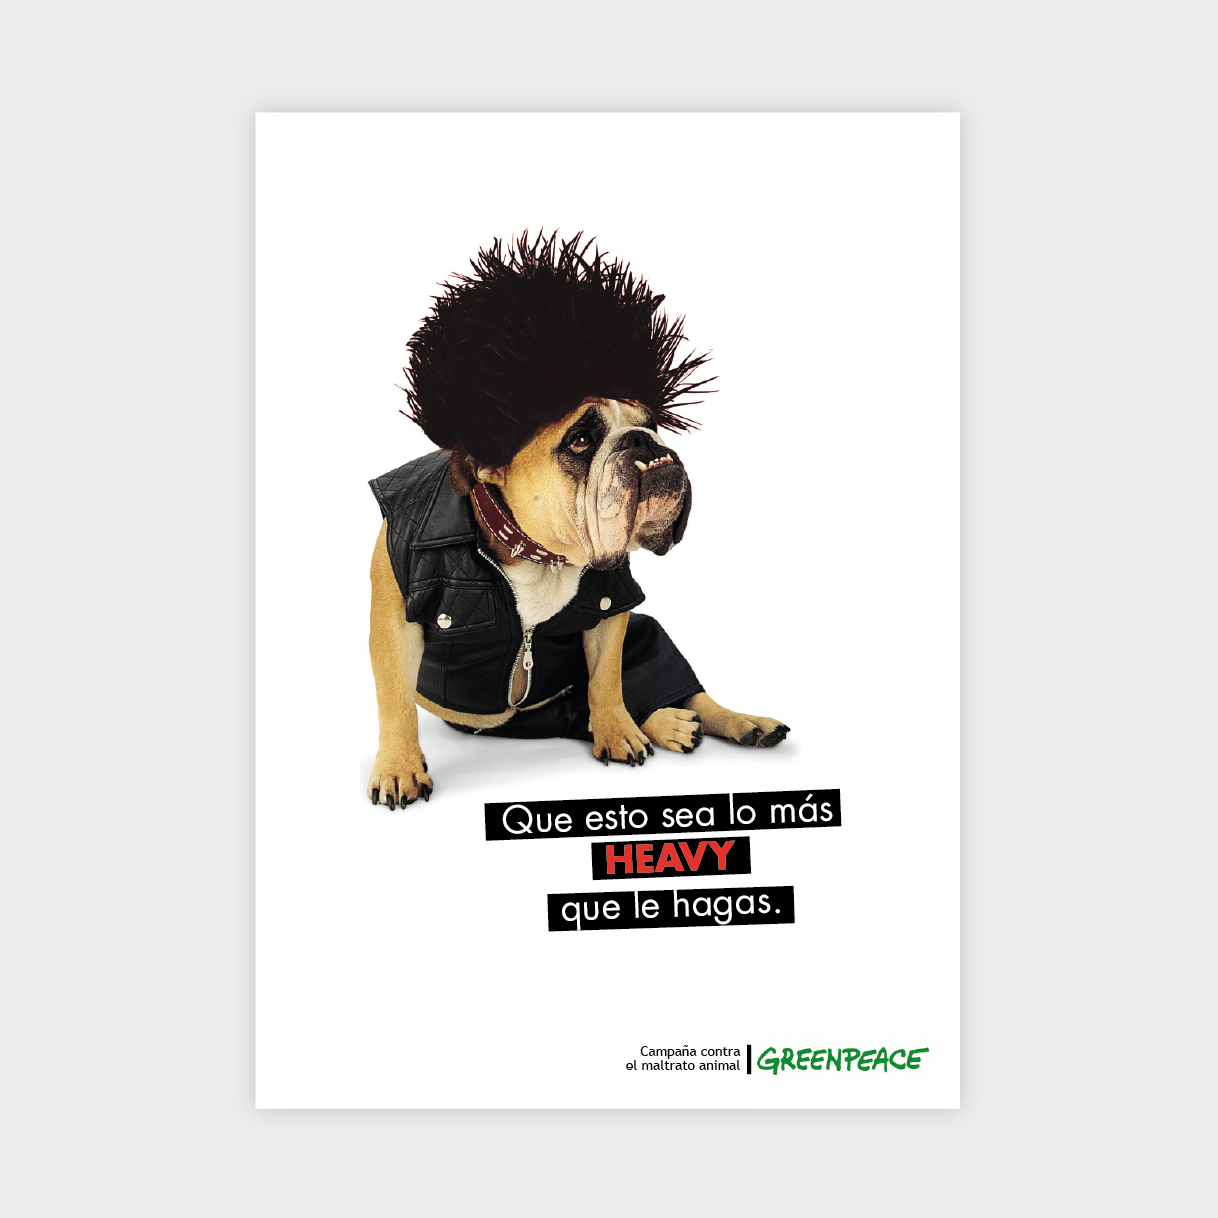 campaña maltrato animal